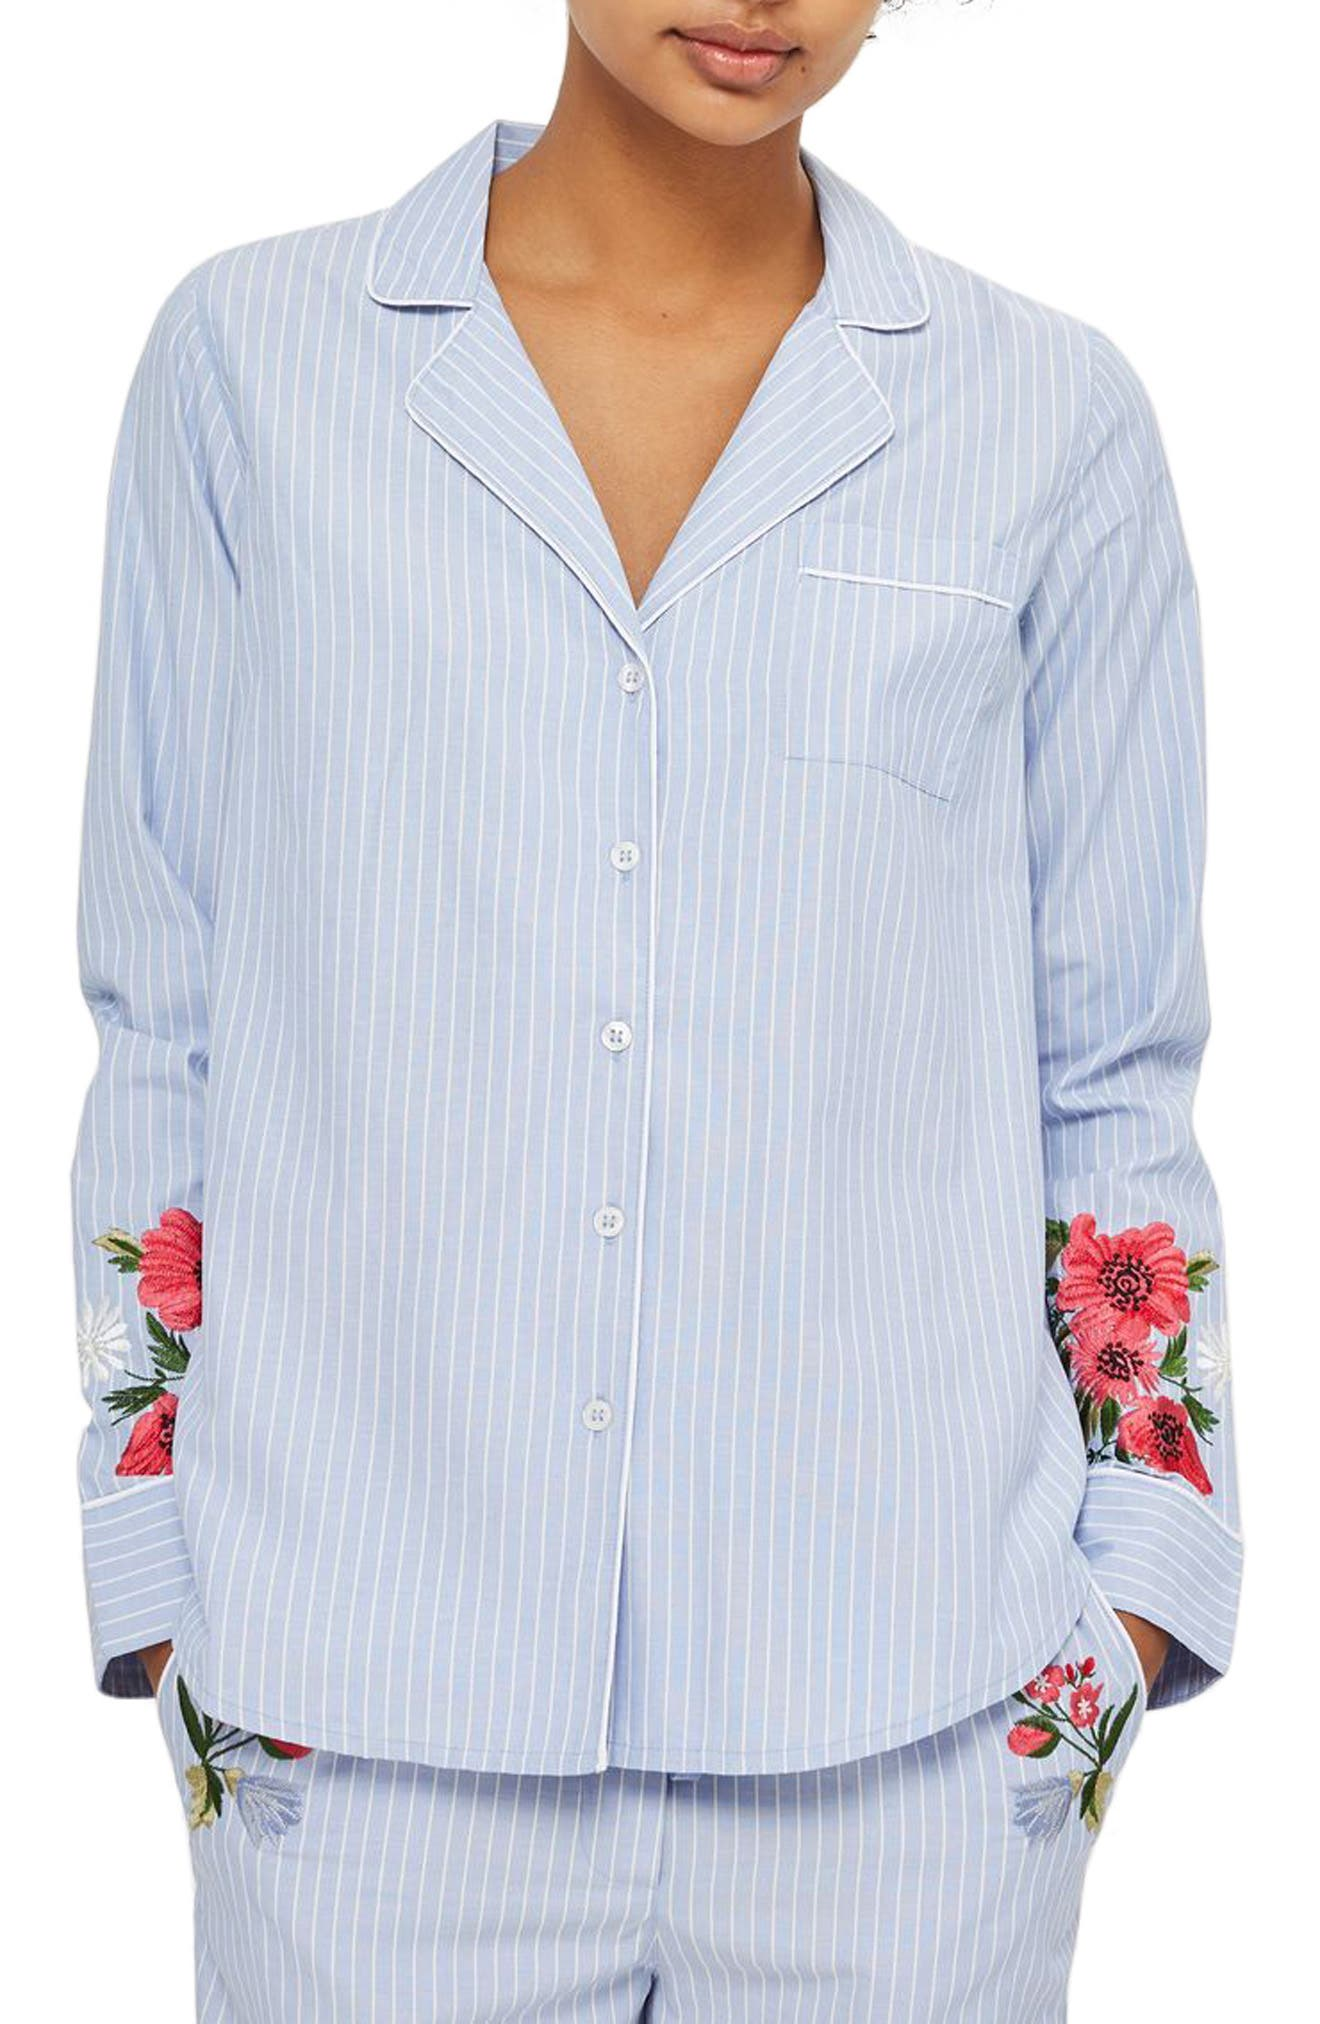 Alternate Image 1 Selected - Topshop Floral Embroidered Stripe Nightshirt